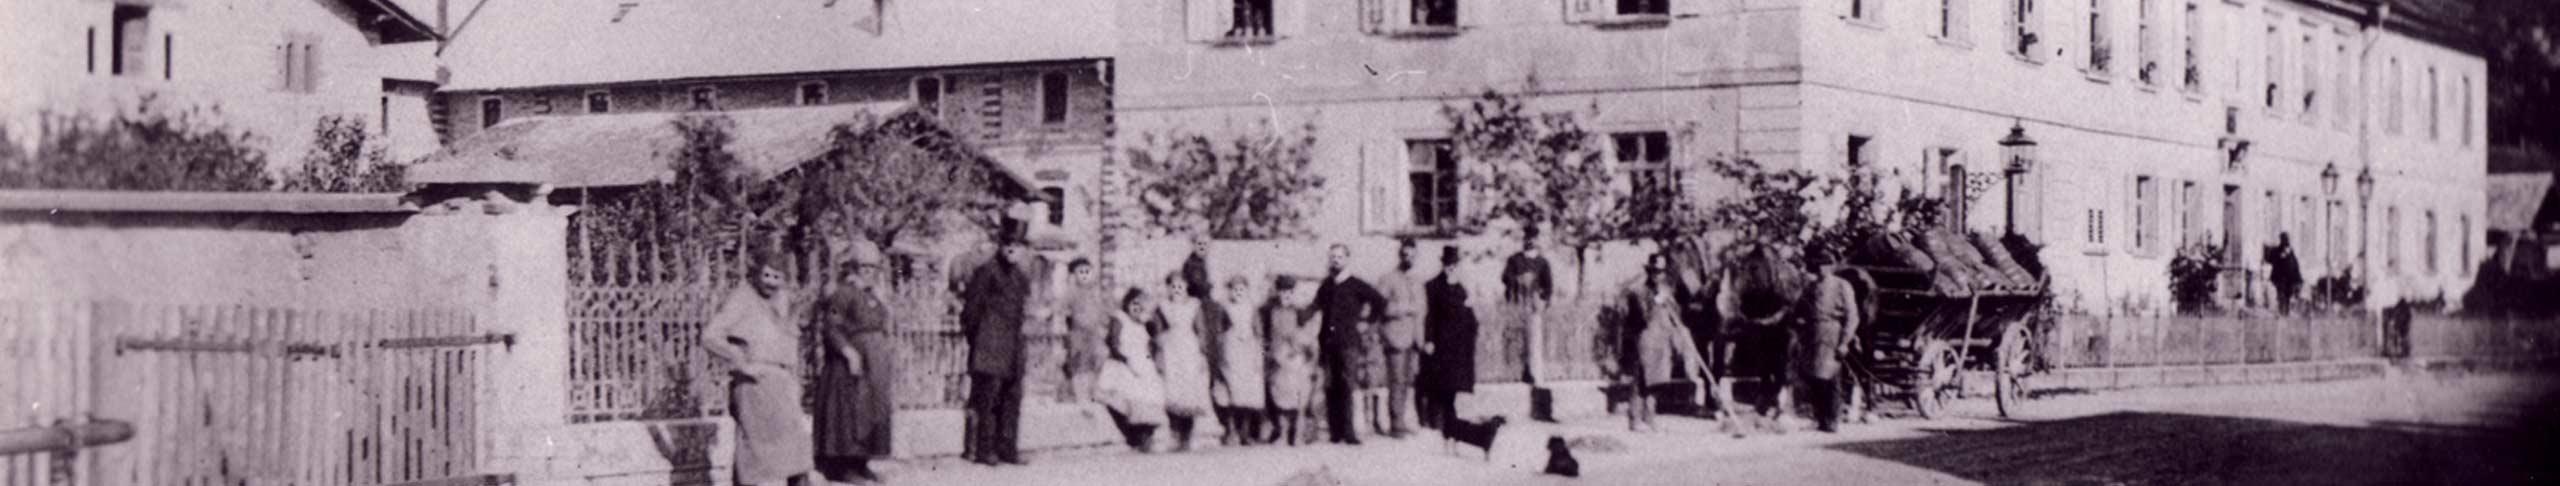 Historie Pappenheimer Malz